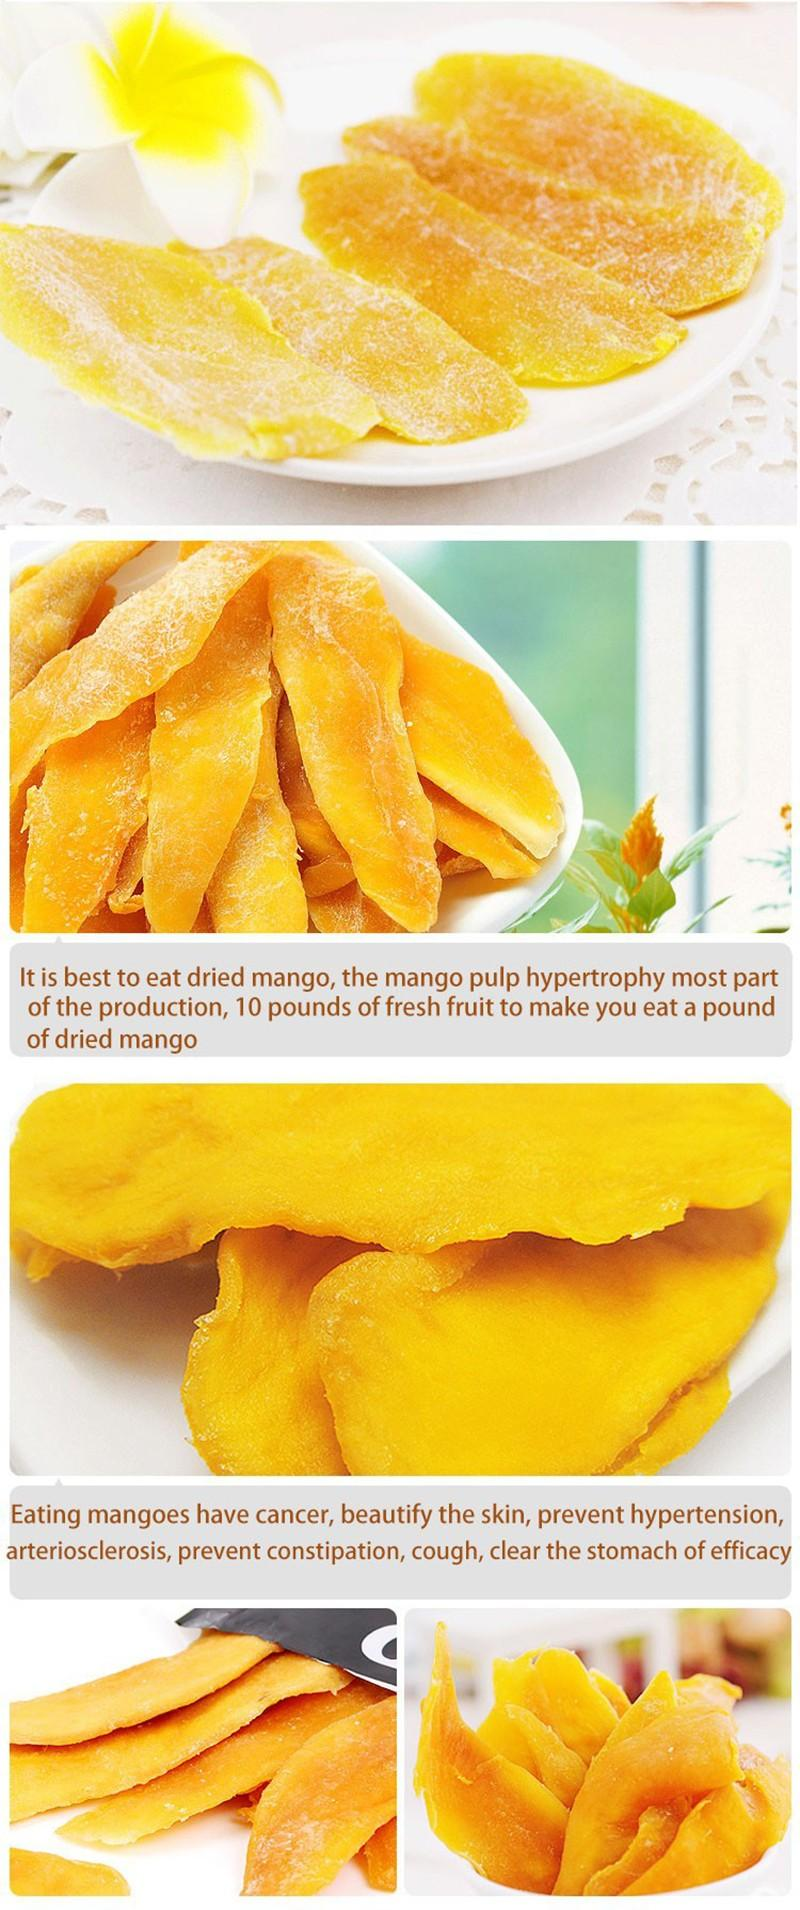 Mango Tea Instant Snack Dried Fruit Food Philippine Dried Mango Snacks 100g  Free Shipping